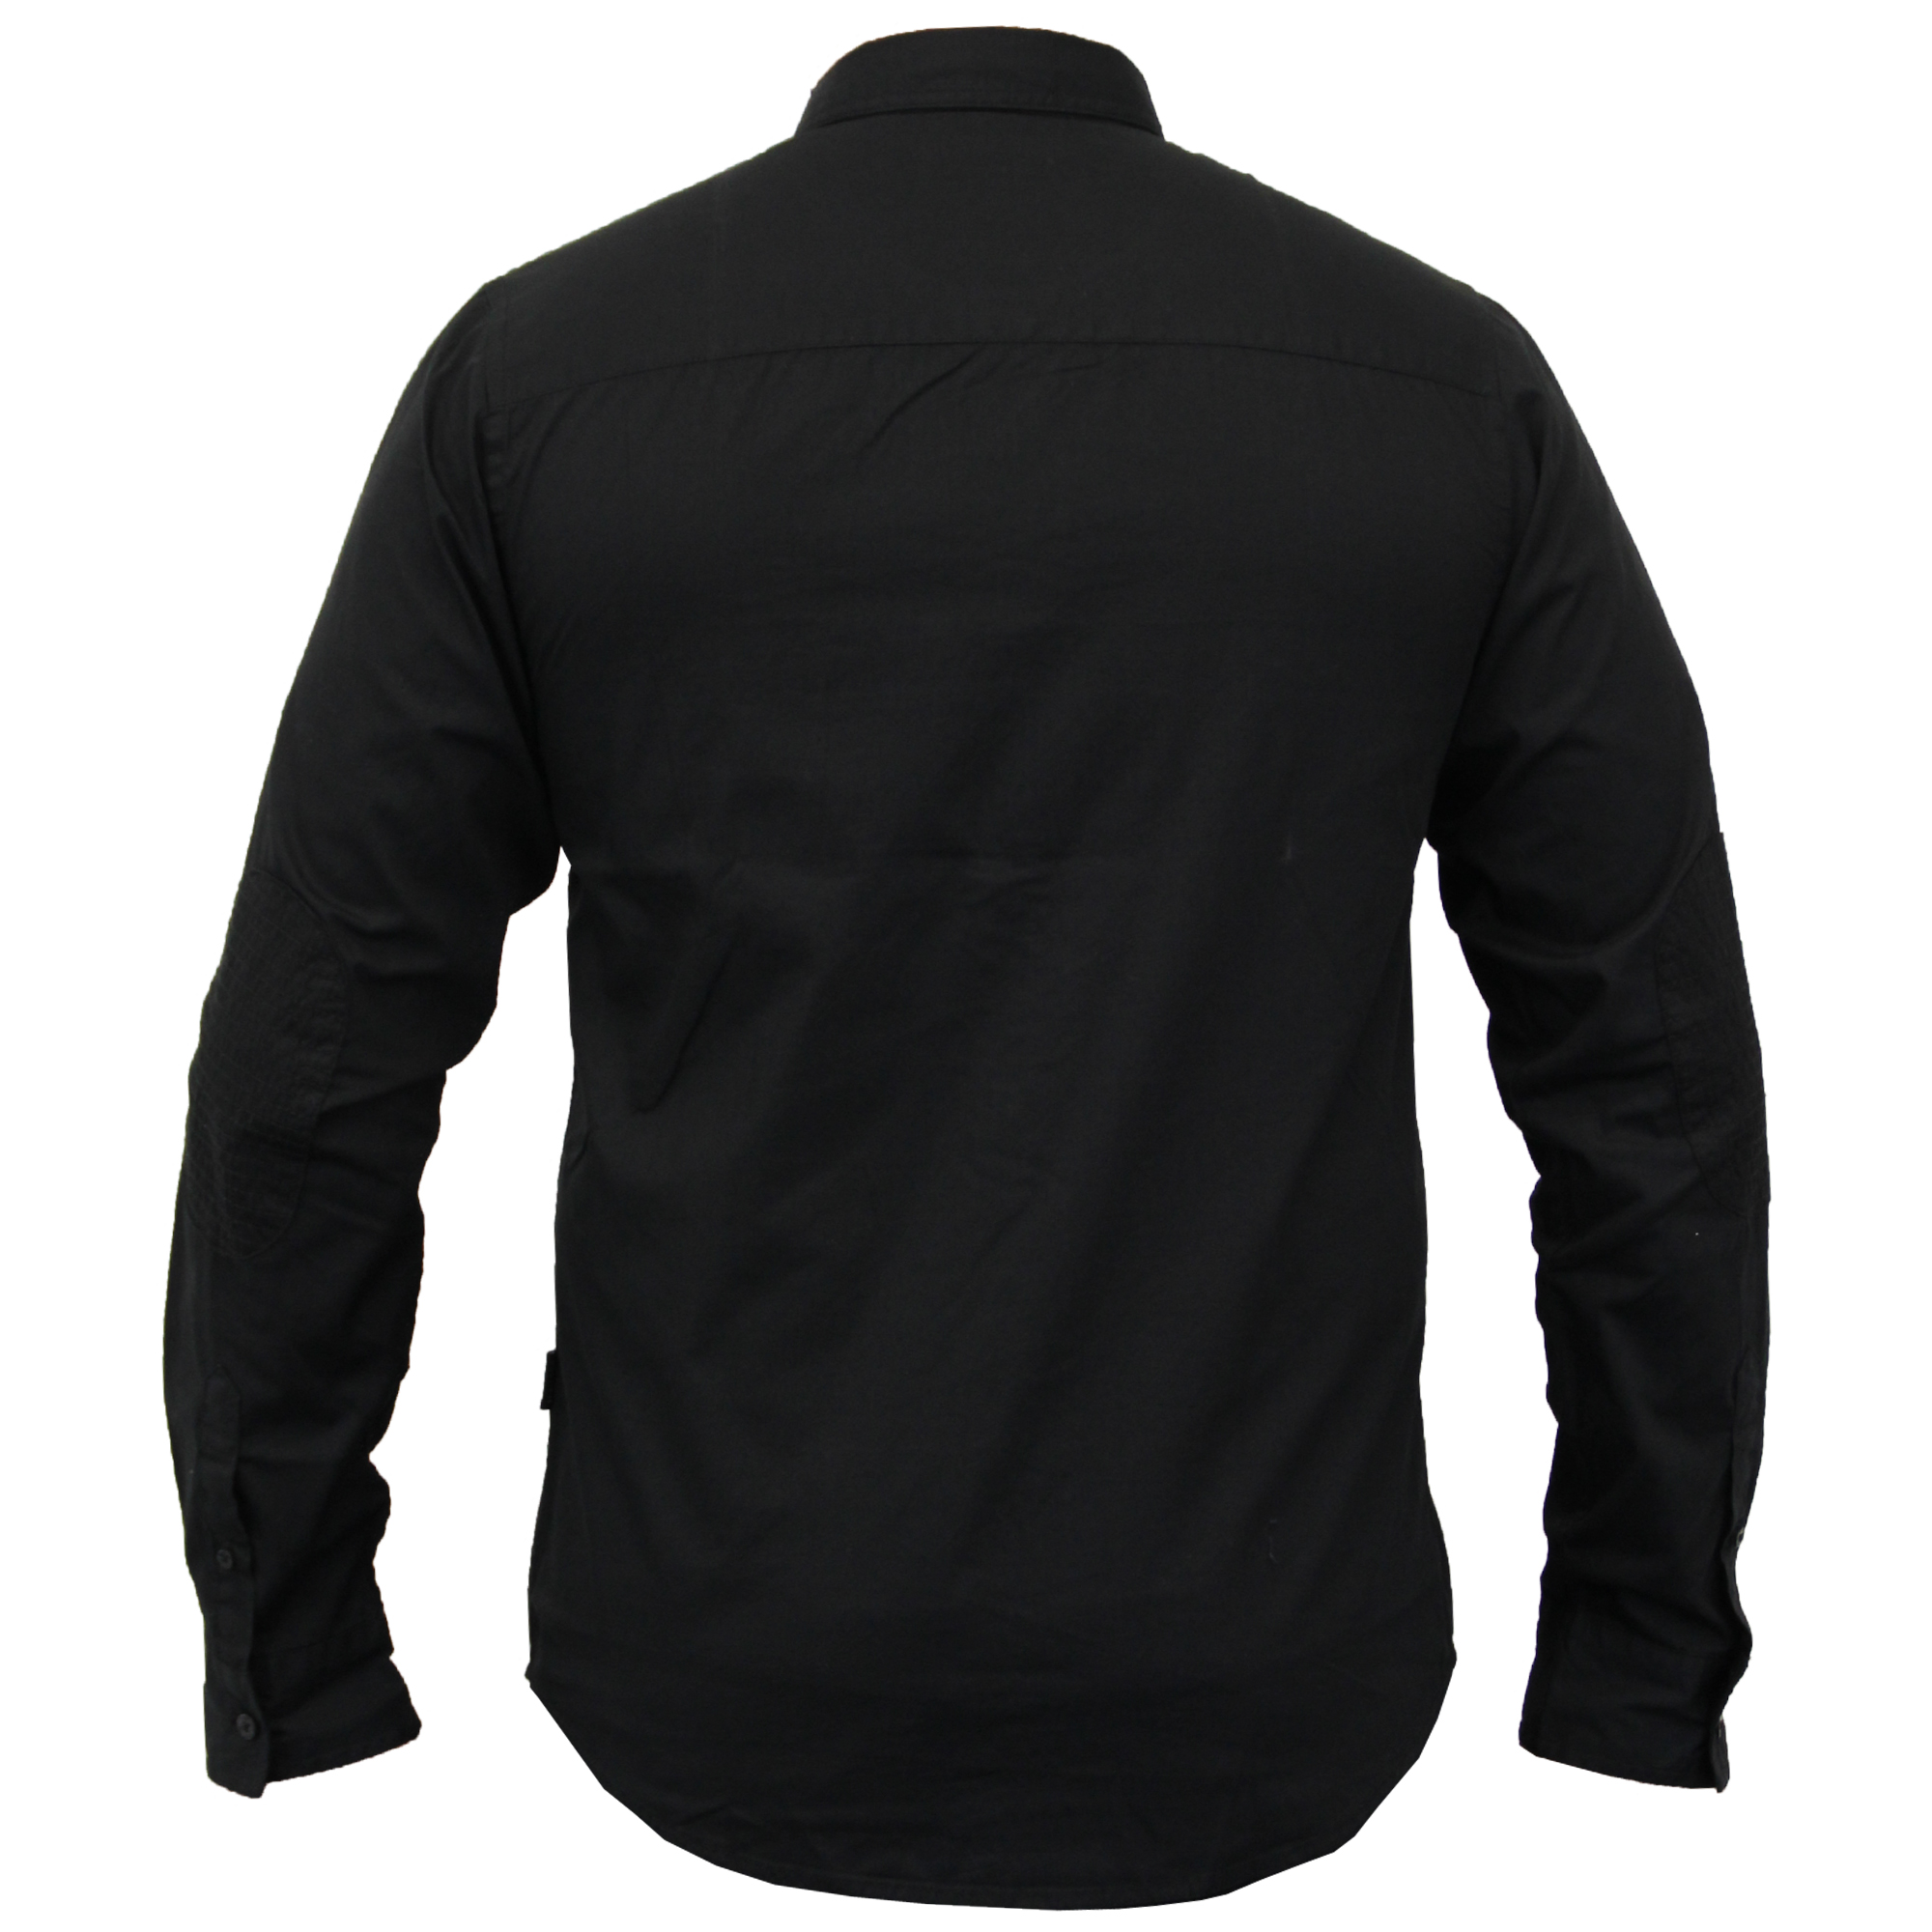 Camisas-de-vestir-para-hombre-de-alma-valiente-Smith-amp-Jones-Manga-Corta-Larga-De-Algodon-Con miniatura 3